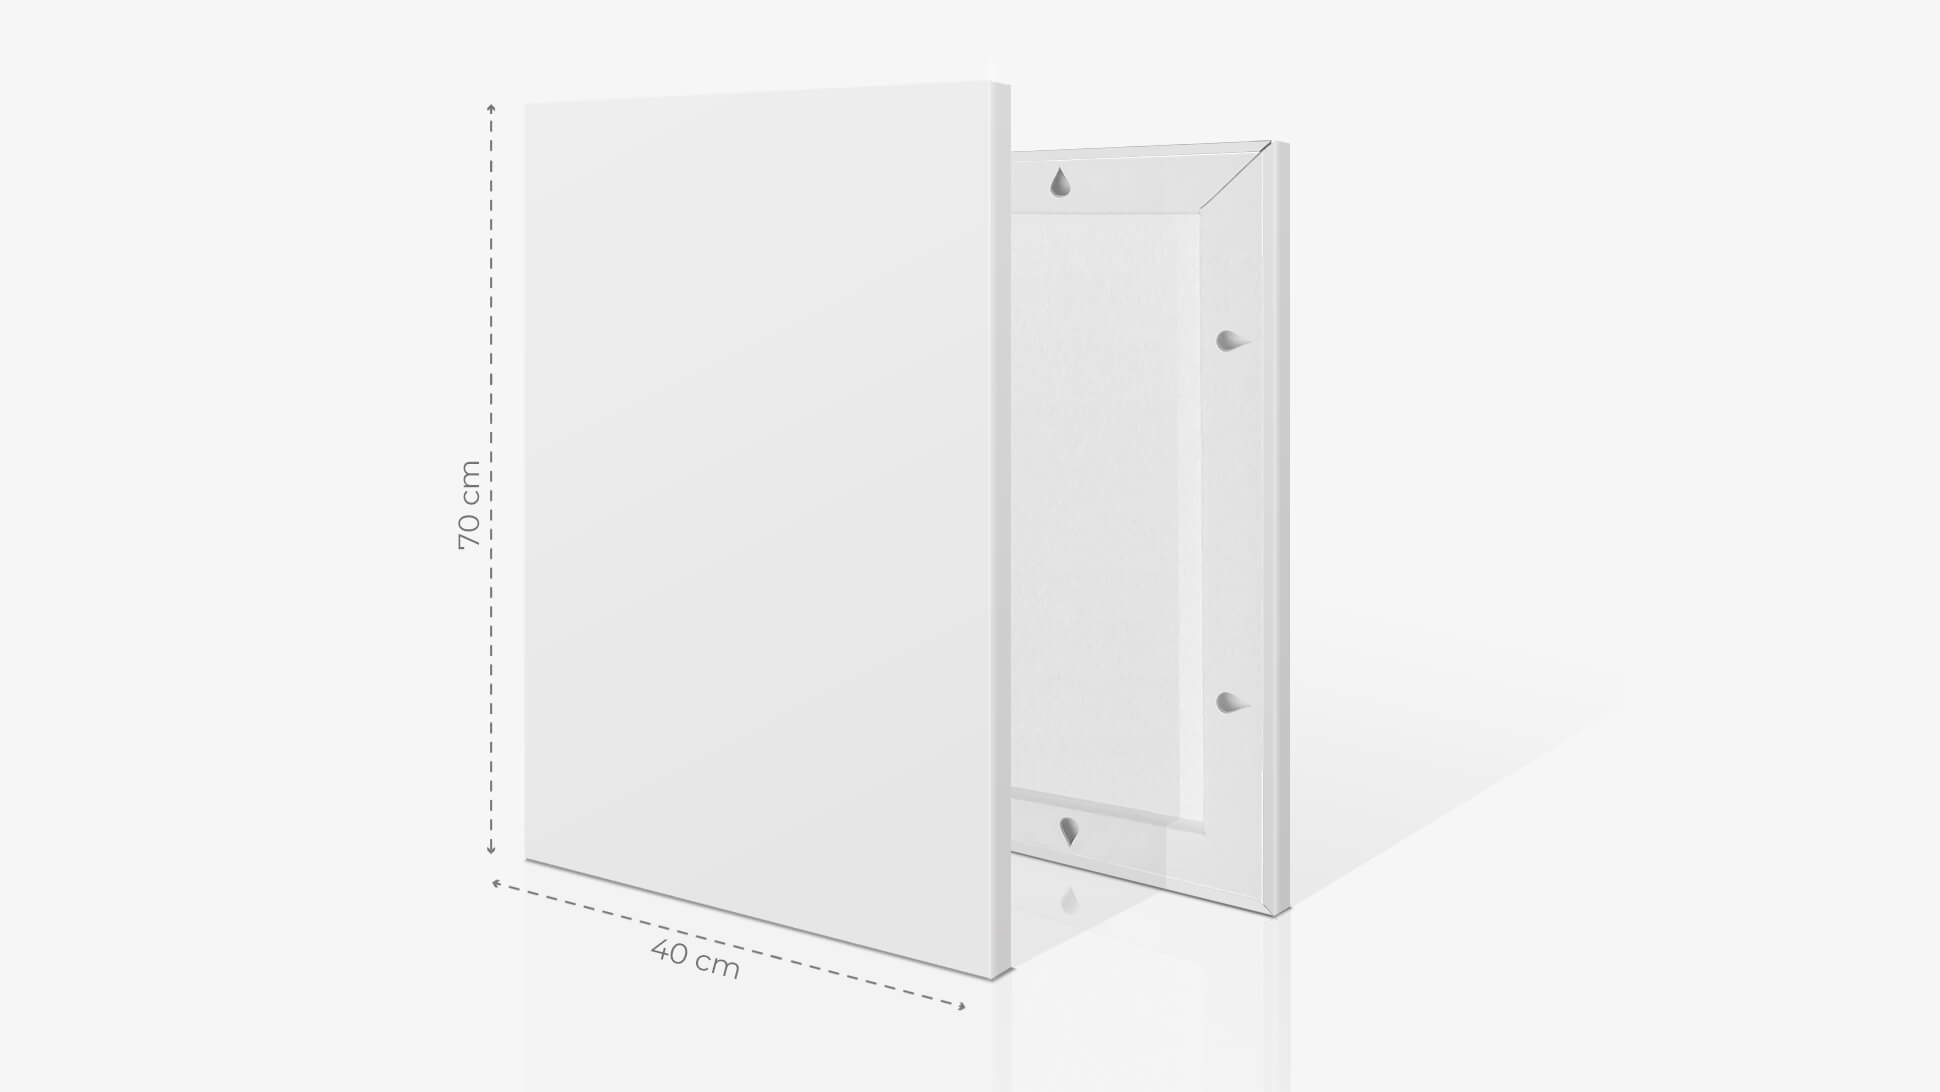 Fotoquadro 40x70 cm | tictac.it